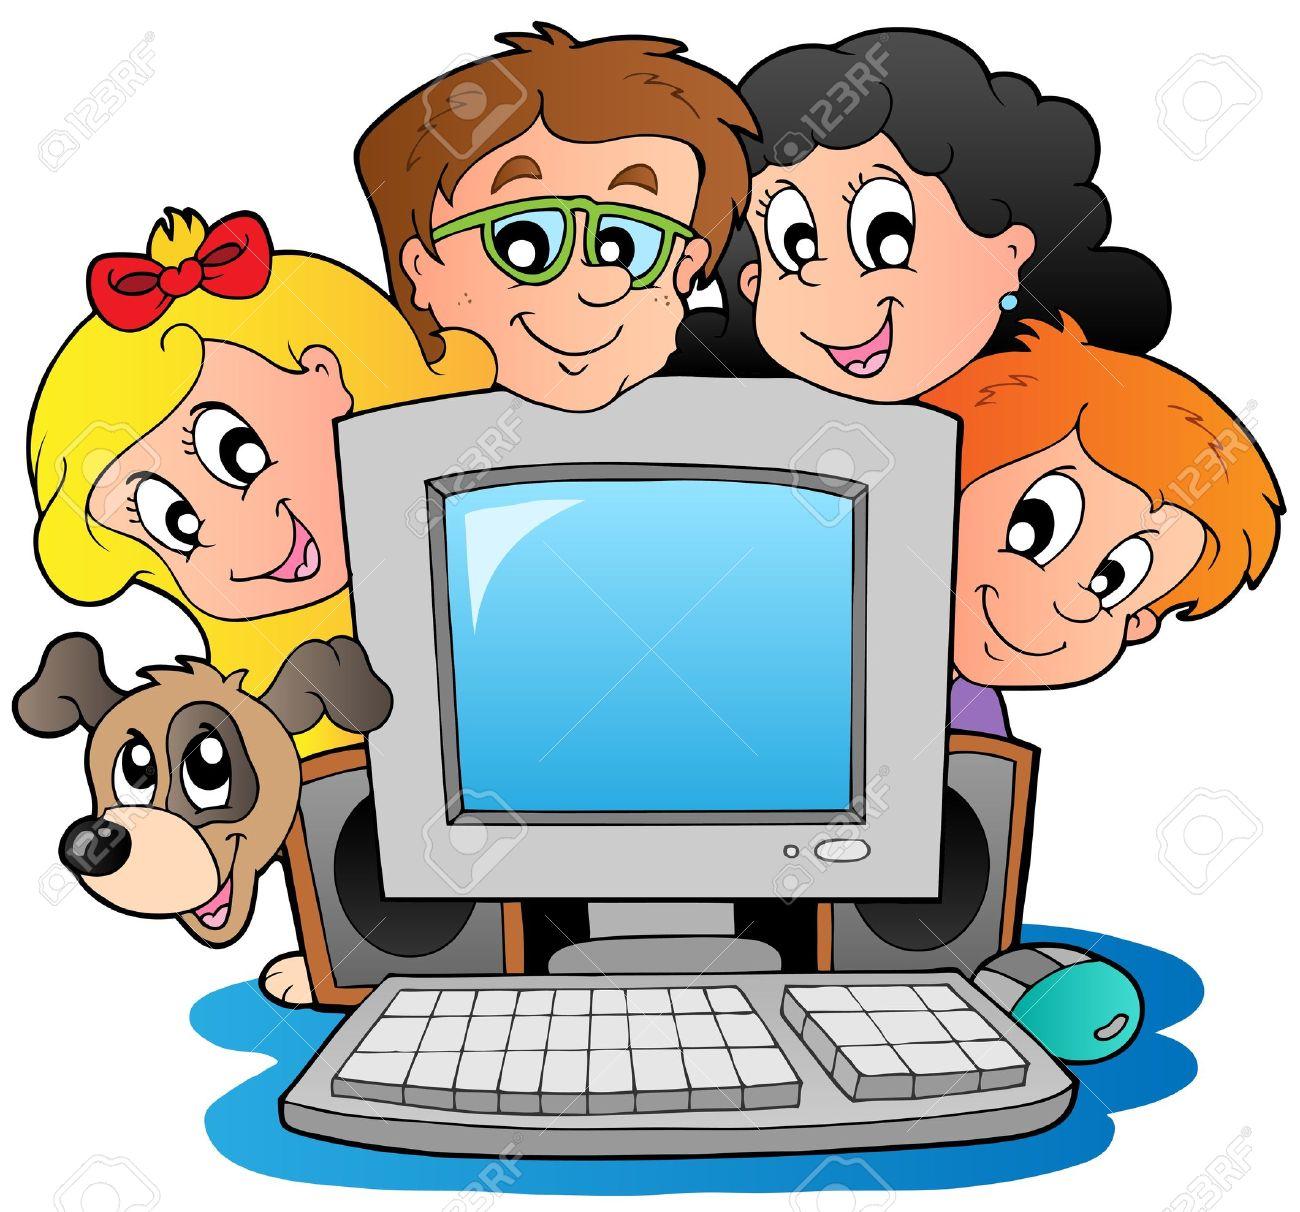 Computer with cartoon kids and dog - 10354188